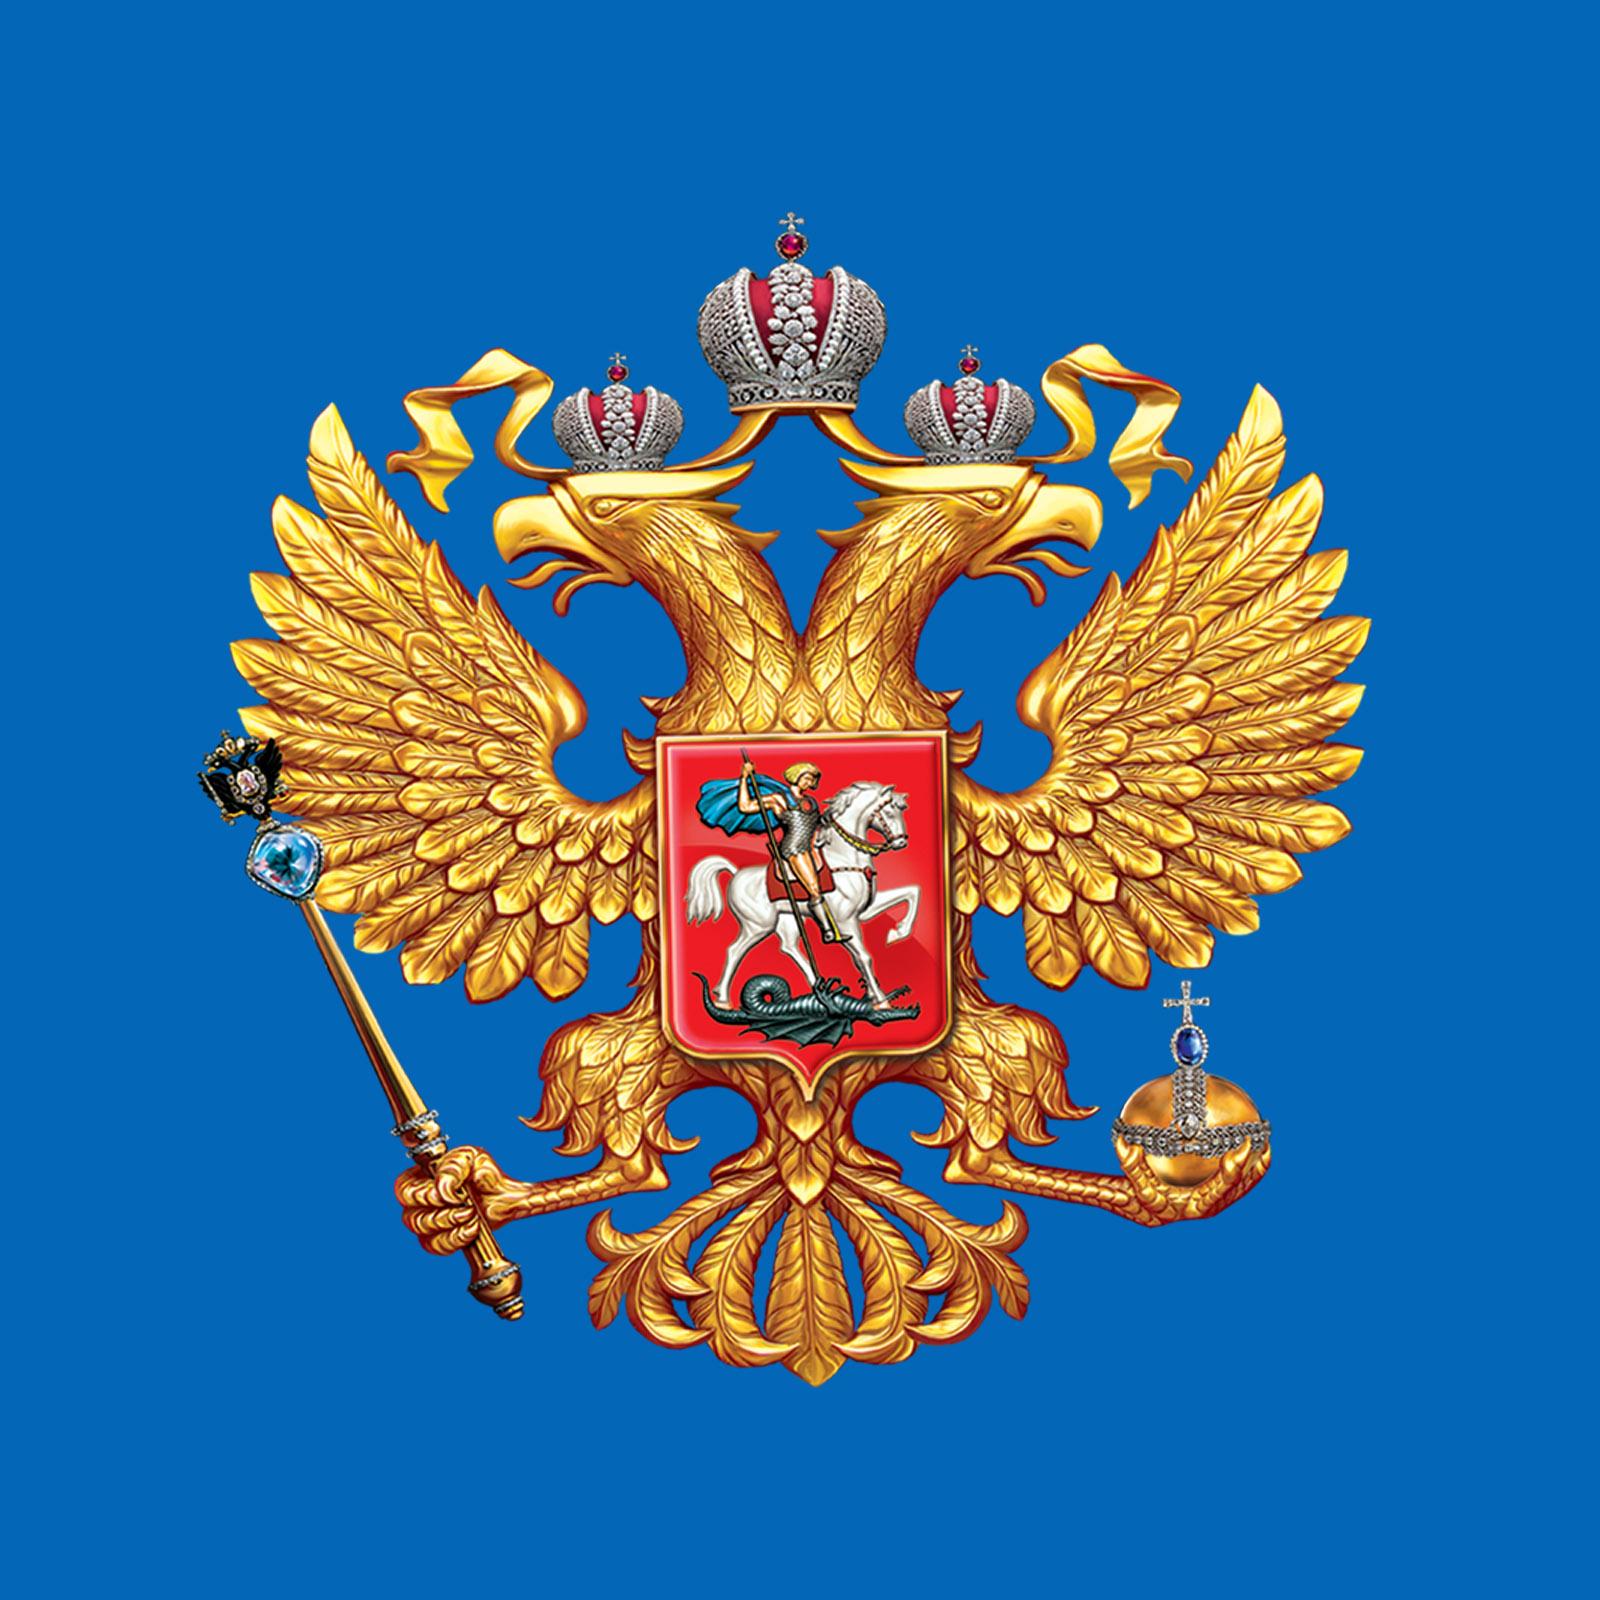 Комфортная синяя футболка Россия